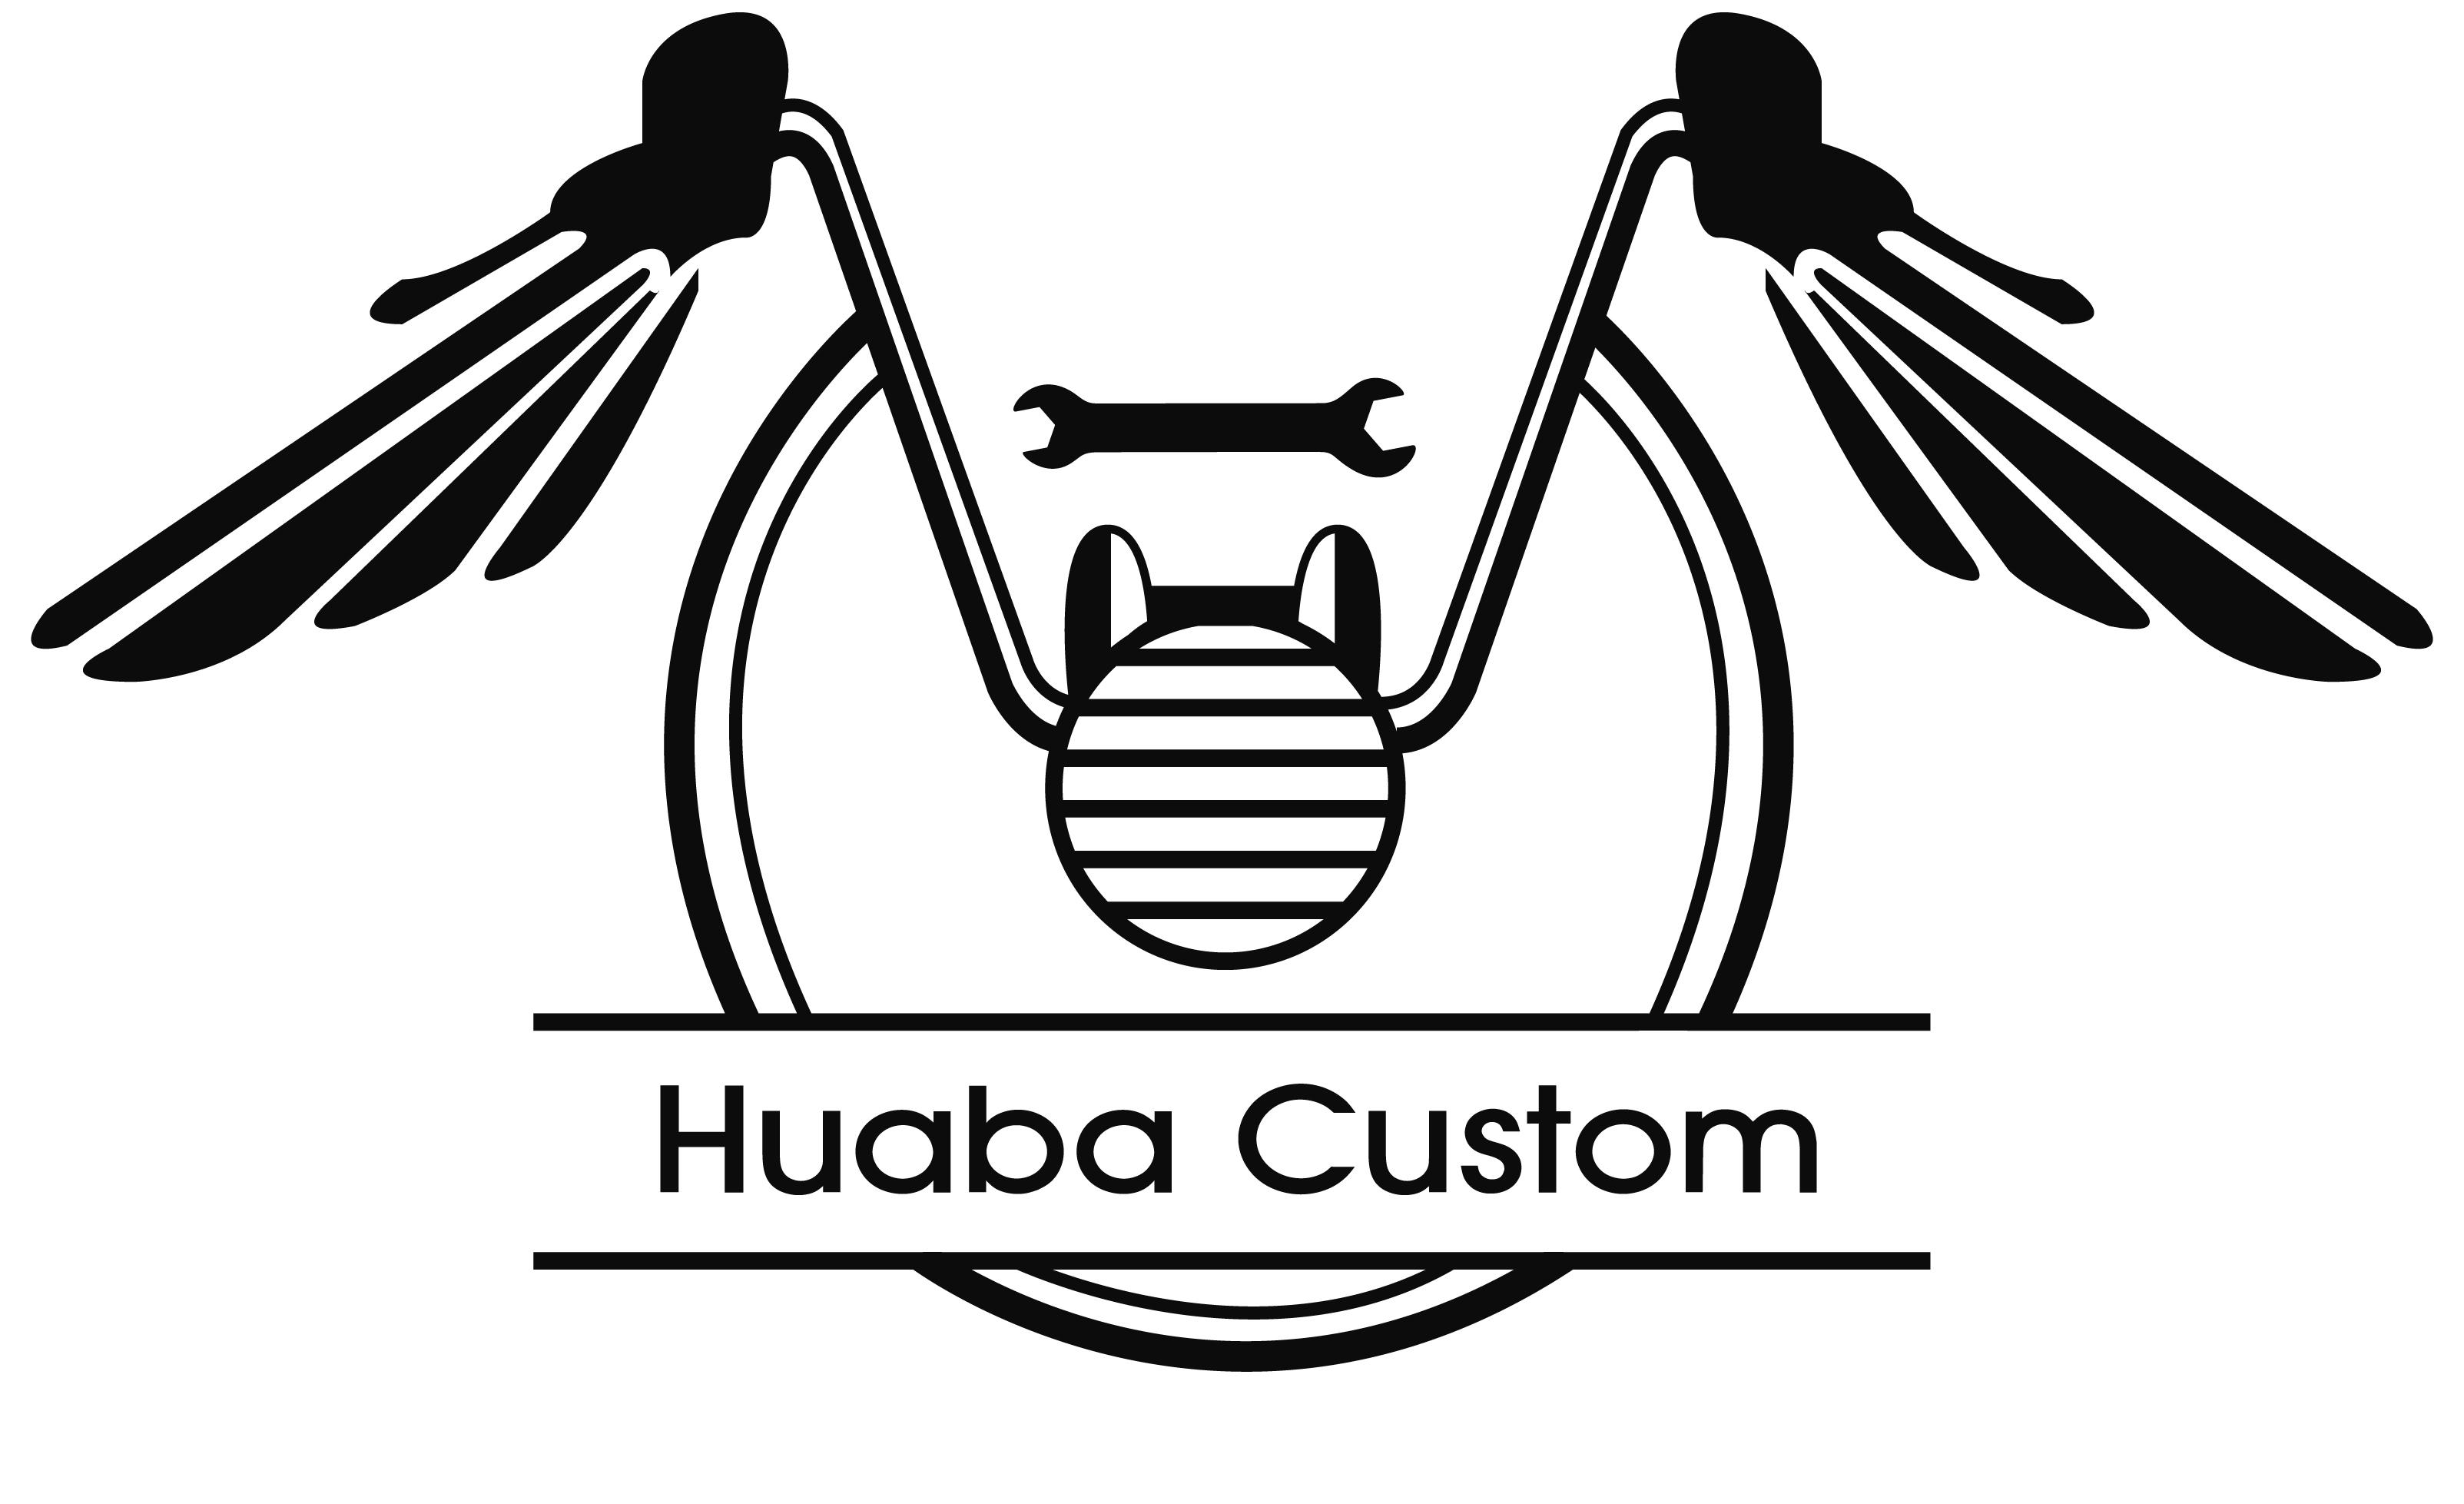 huaba custom finsing kontaktieren. Black Bedroom Furniture Sets. Home Design Ideas